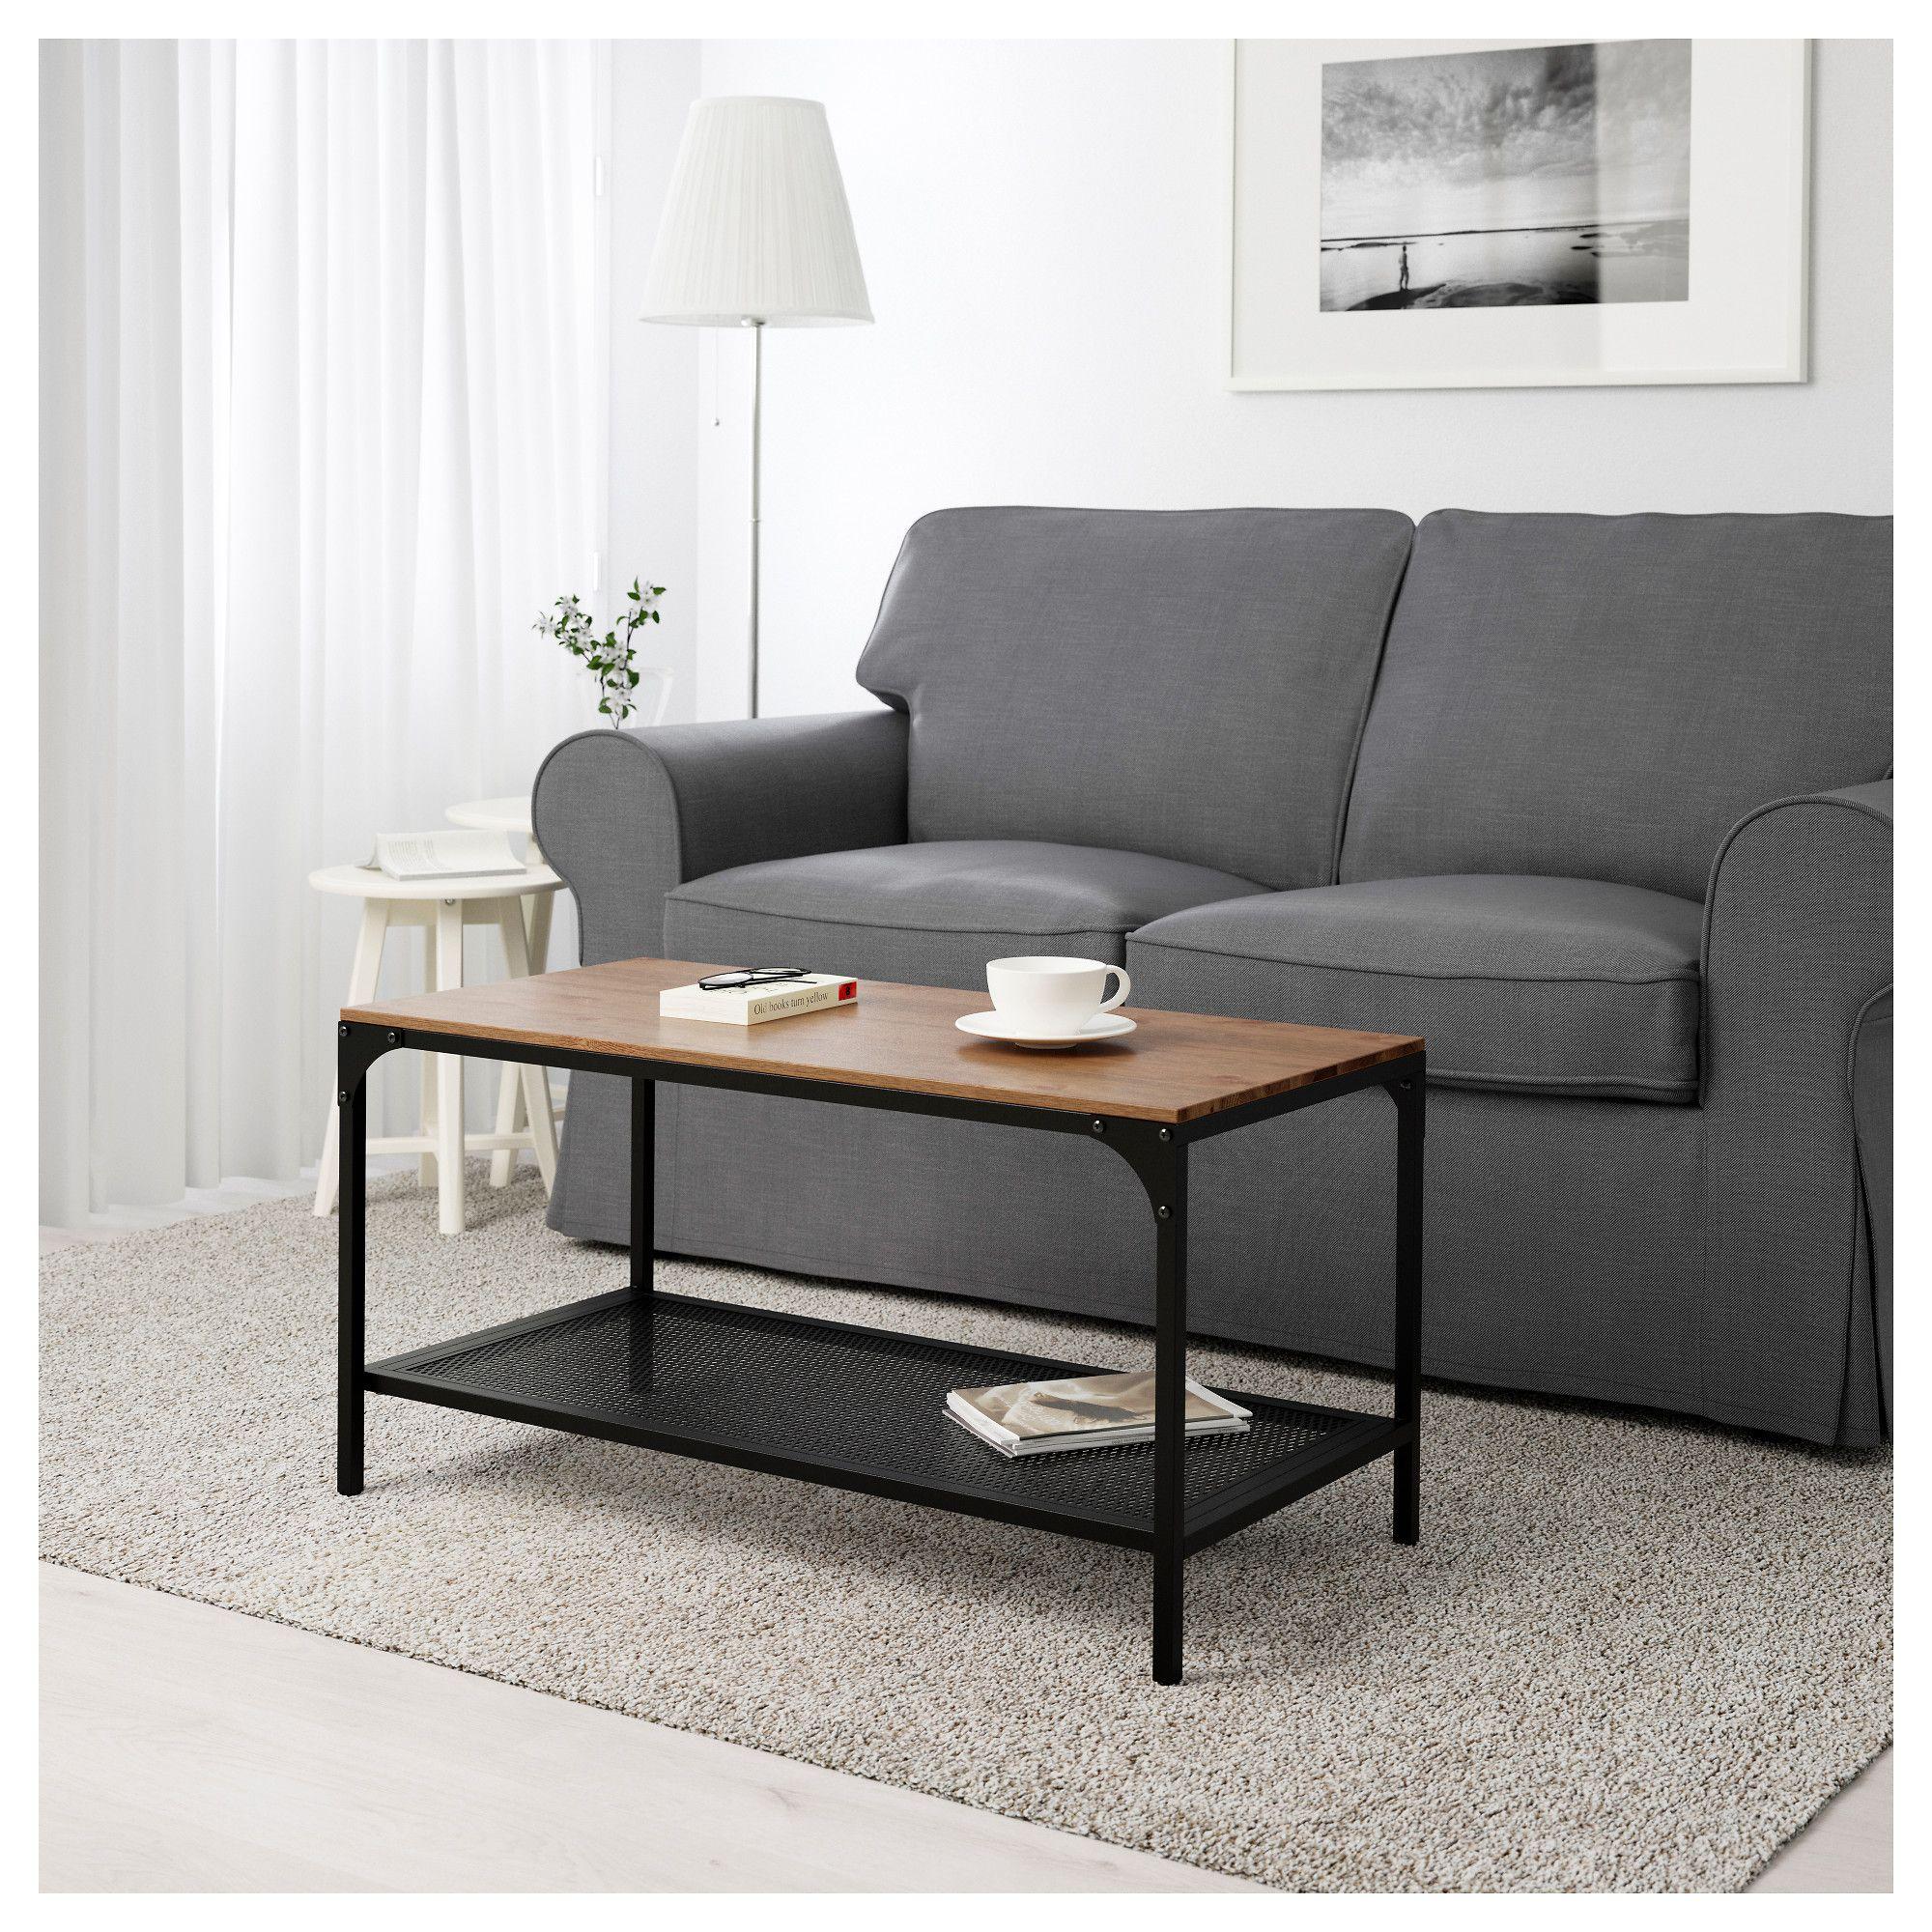 Fjallbo Coffee Table Ikea Coffee Table Ikea Coffee Table Ikea